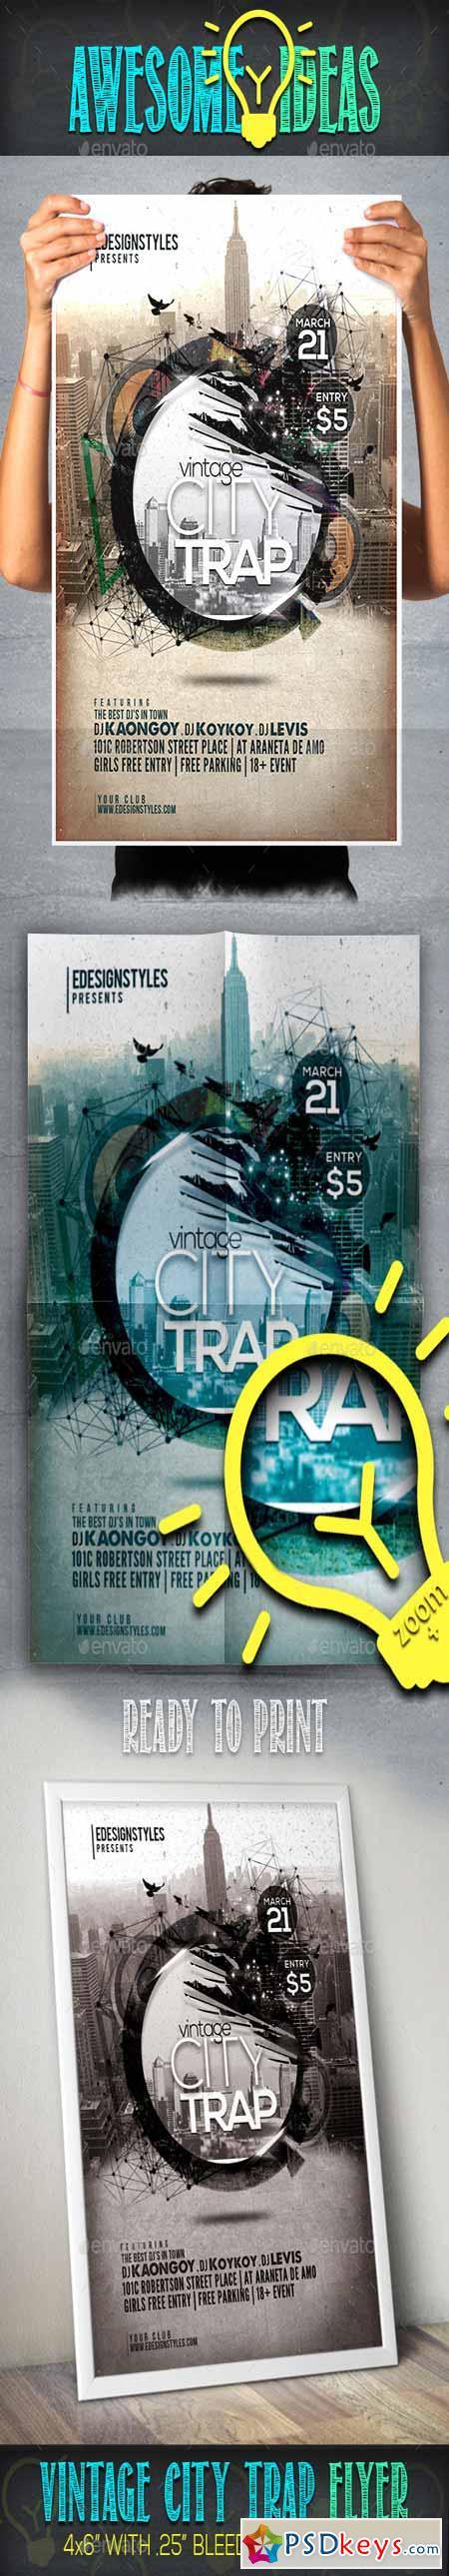 VIntage City Trap Flyer 10863548